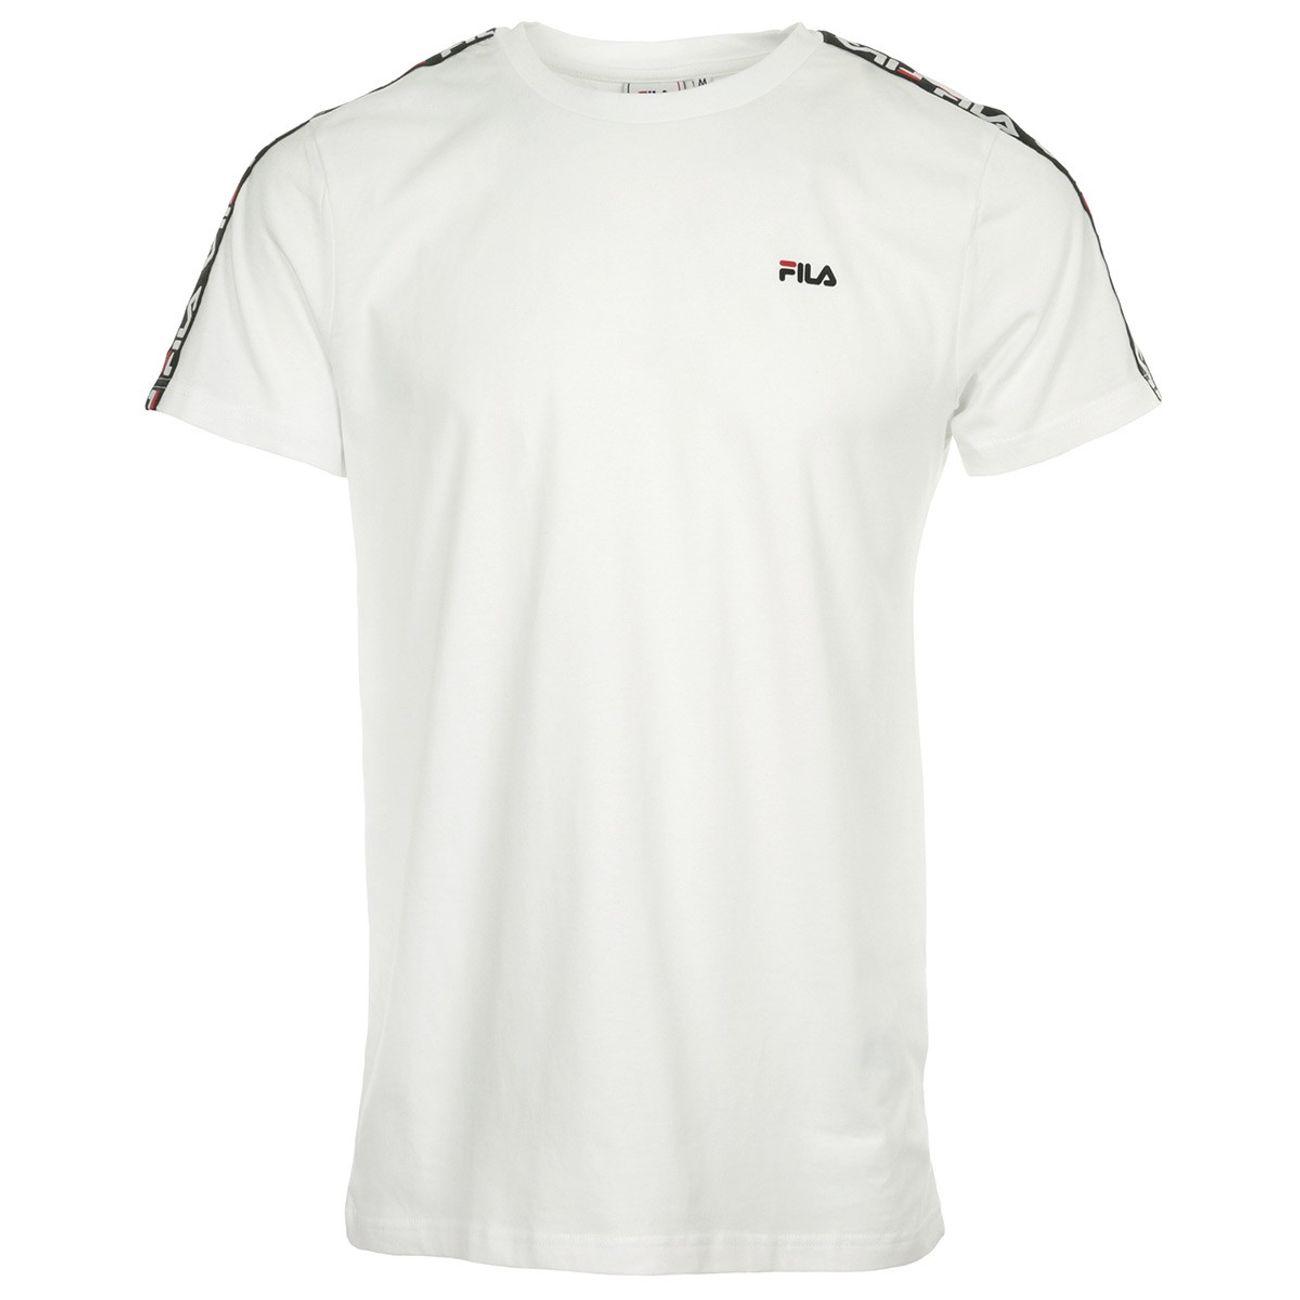 Mode- Lifestyle homme FILA T-shirt Fila Vainamo Tee Ss 687217M67